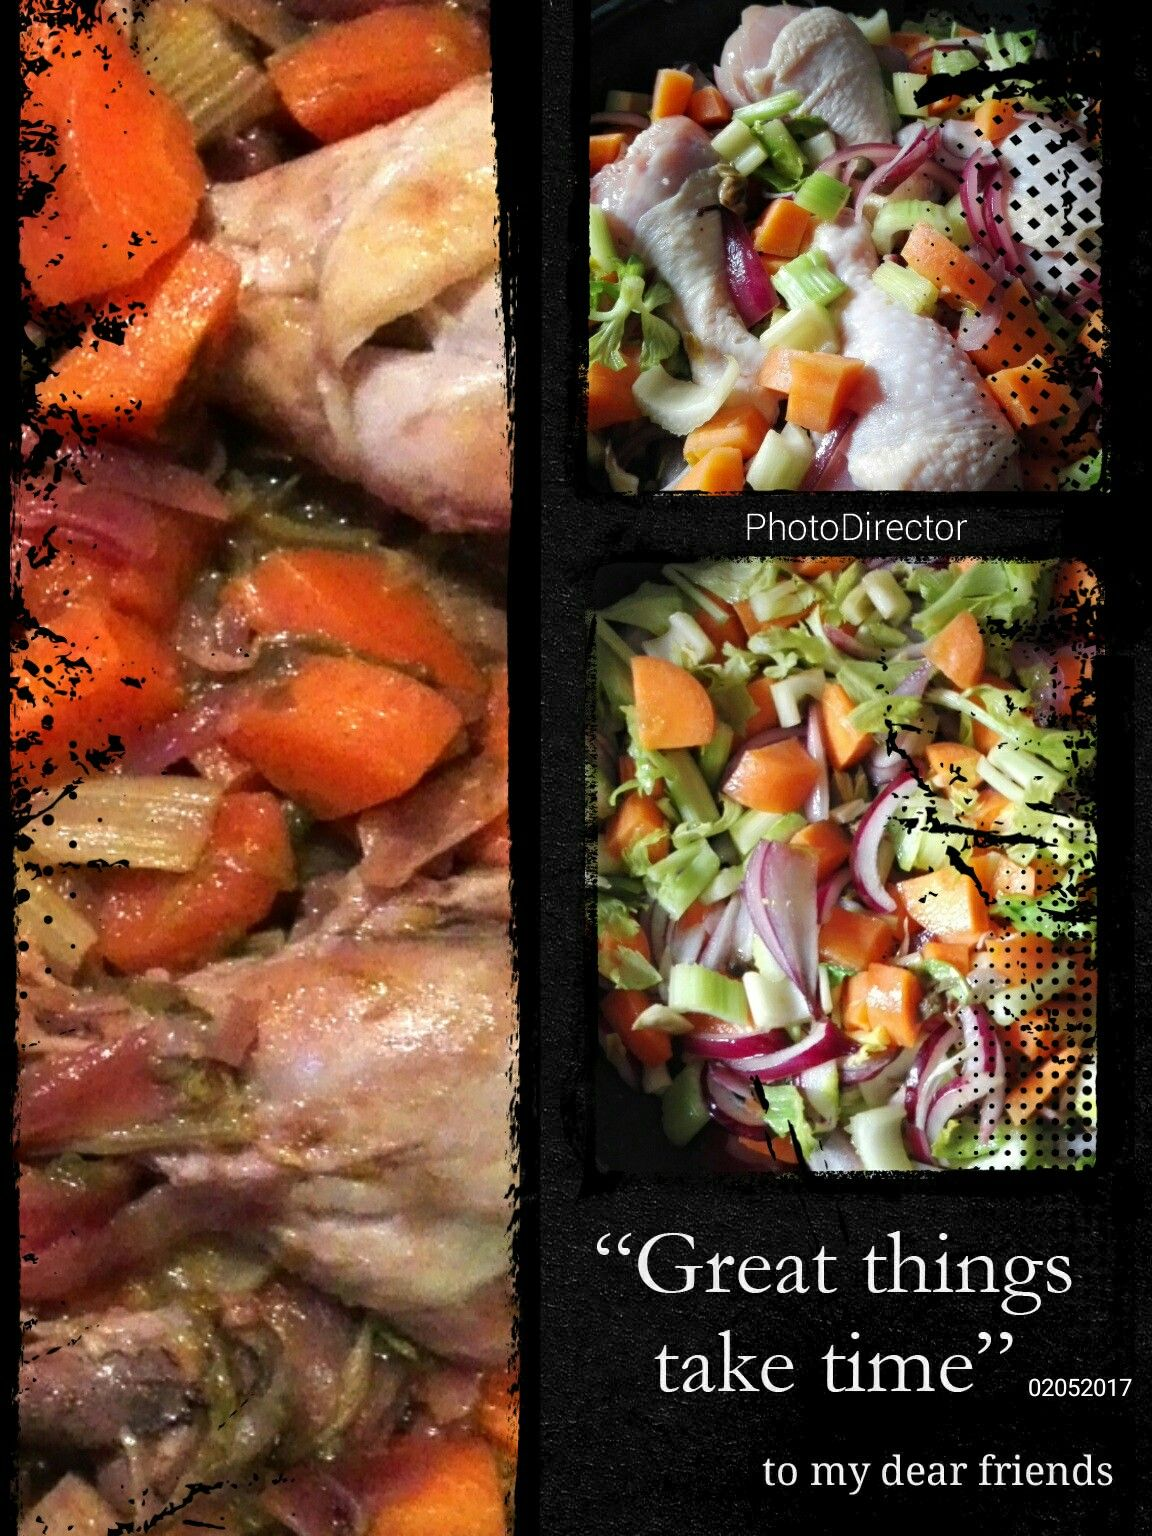 Vinegar chicken with vegetables. Soon on panecioccolata.it